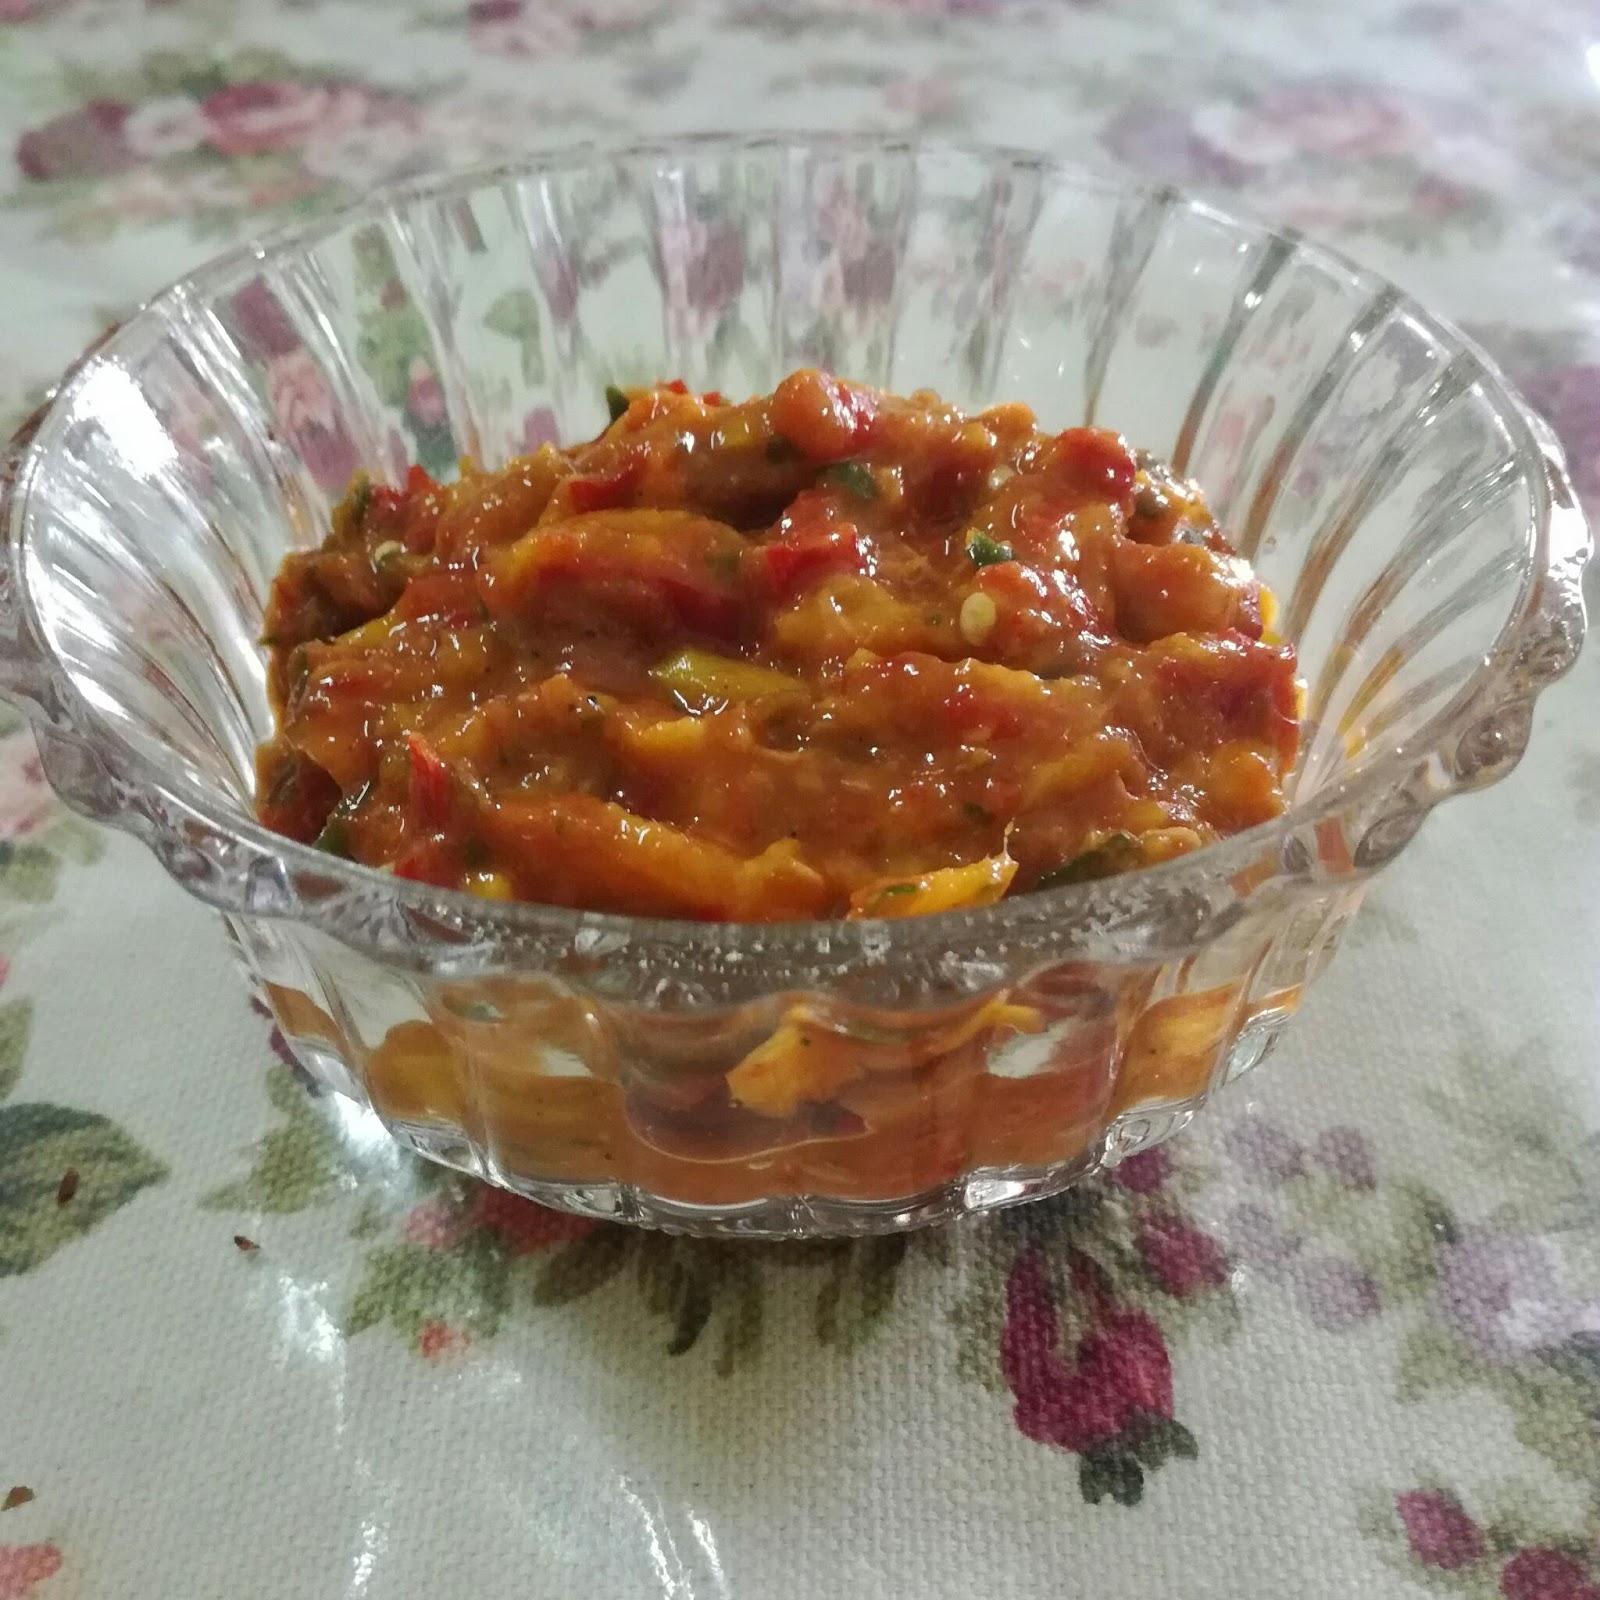 resep sambal kuini resepi sambal belacan buah kuini resepi merory sedap betul lihat Resepi Sambal Pecel Ayam Indonesia Enak dan Mudah